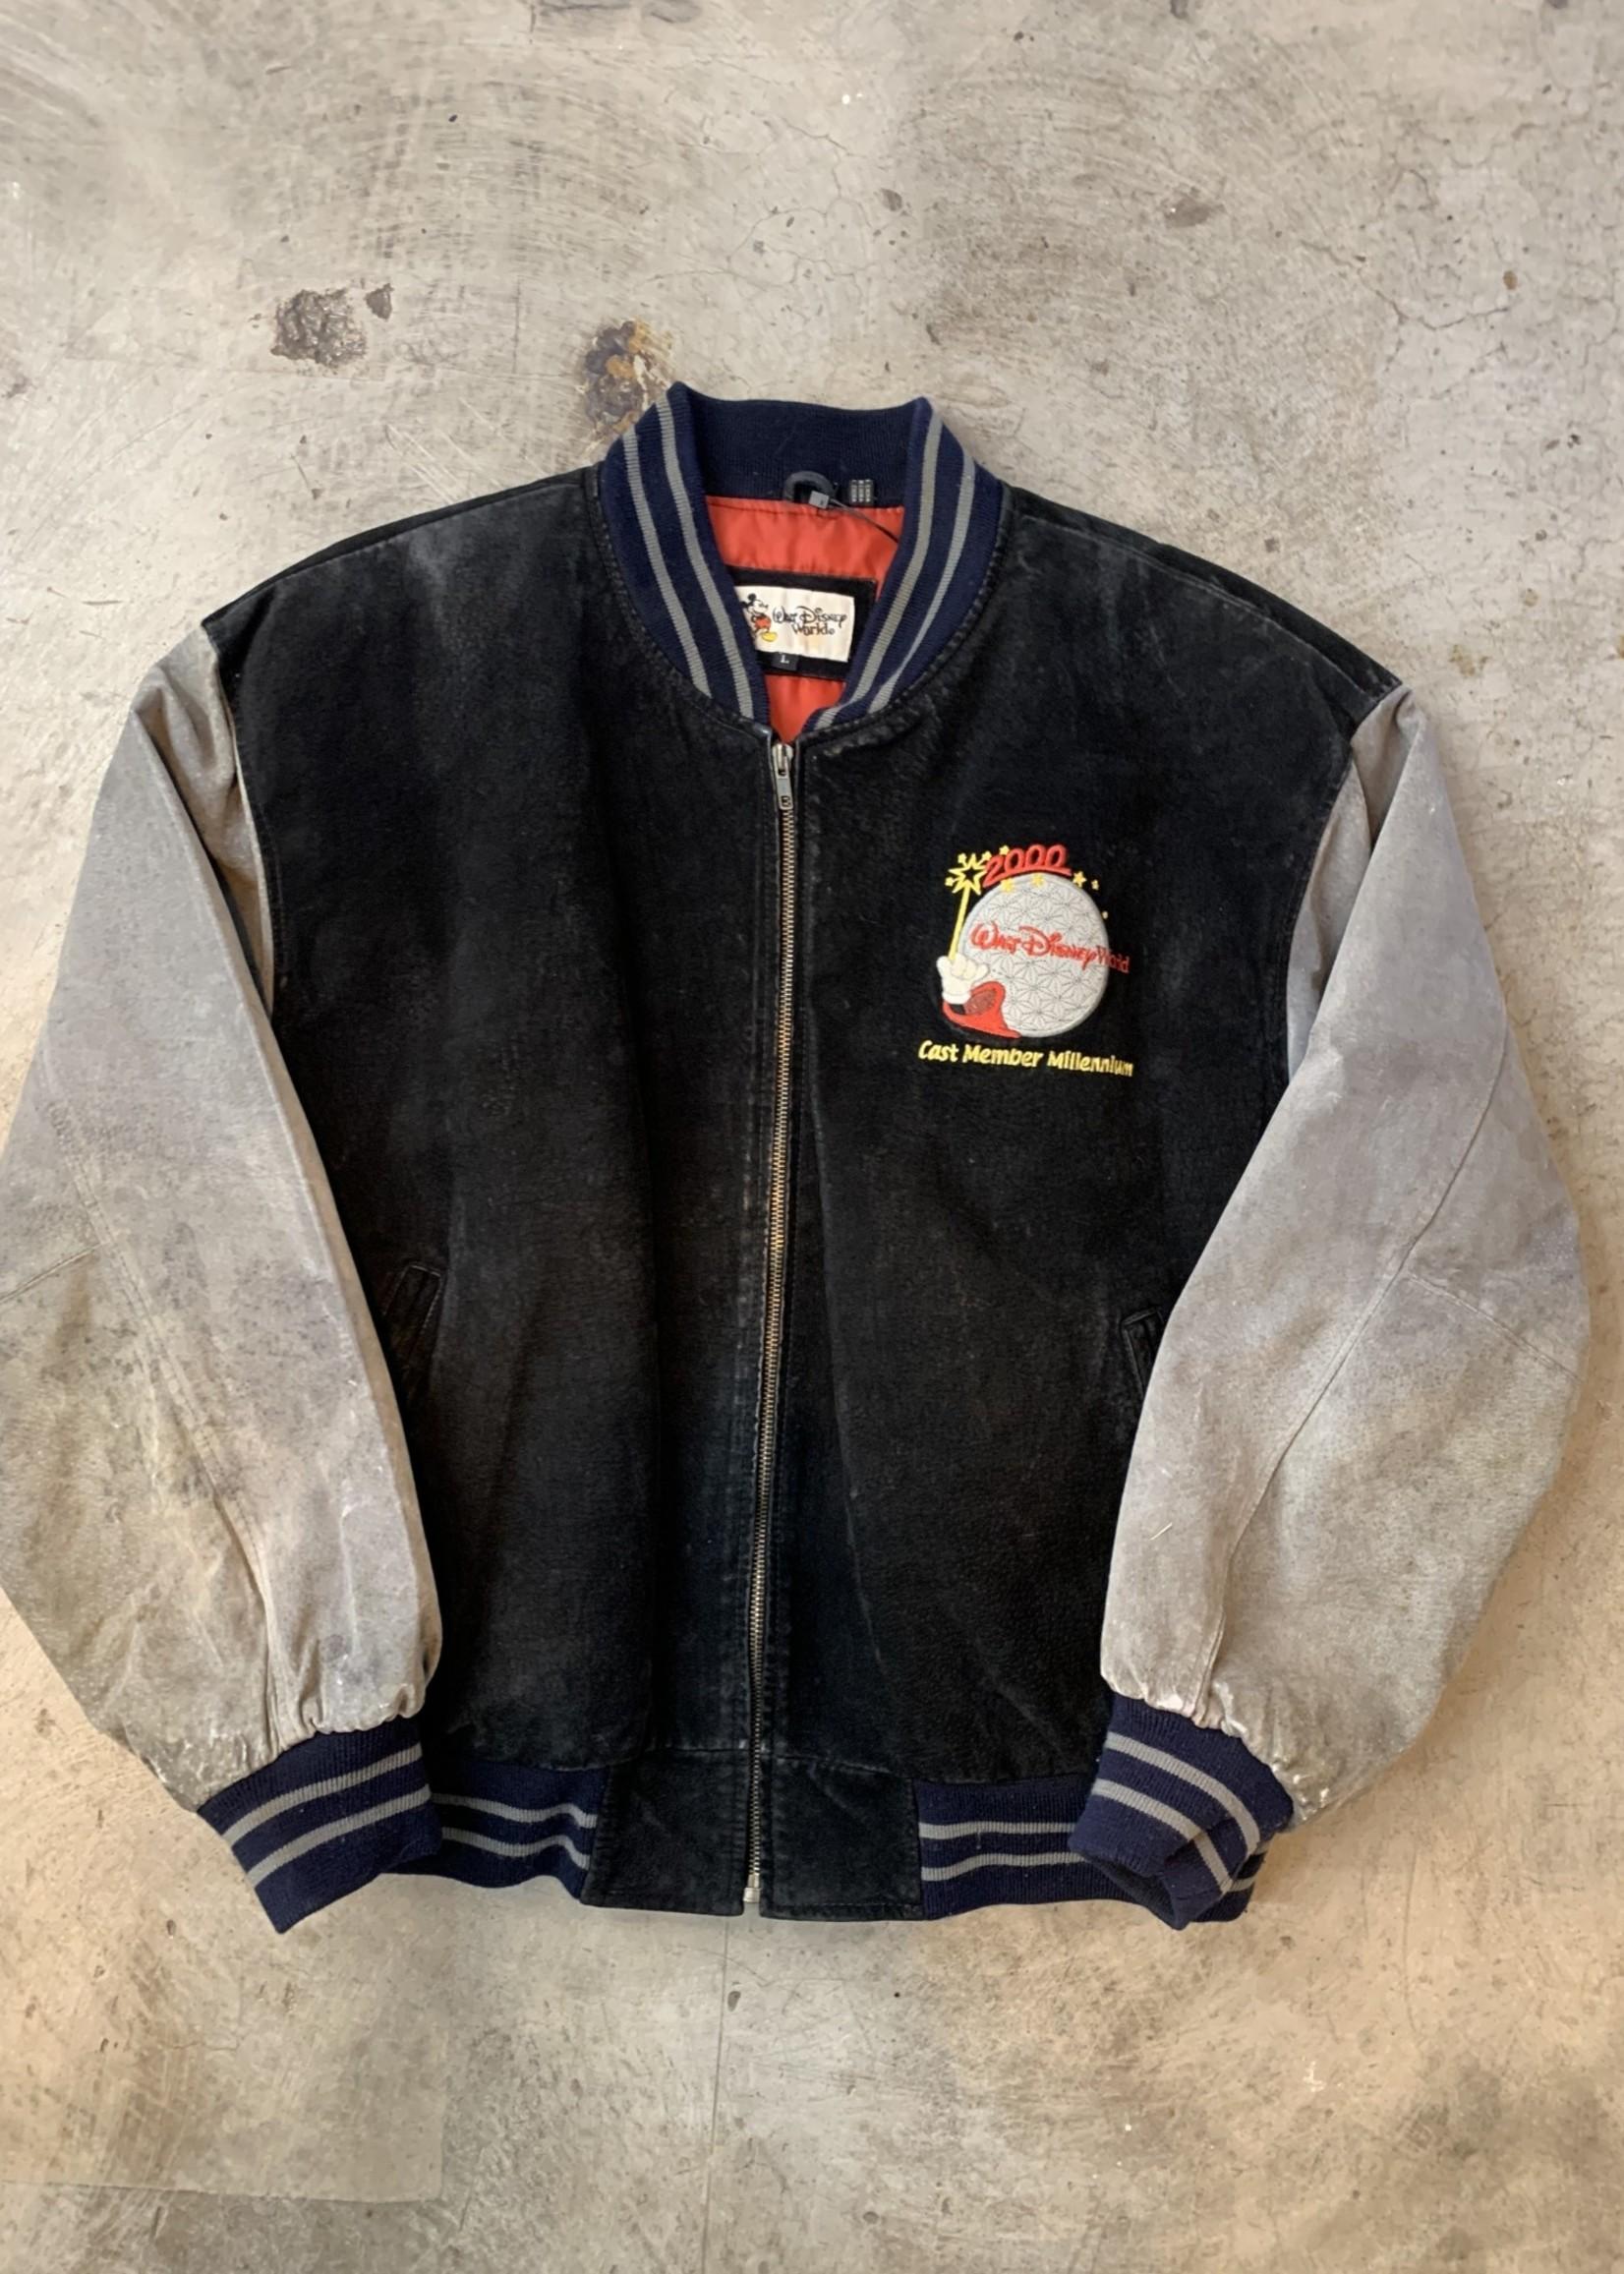 RARE Vintage 2000 Disney Cast Member Suede Leather Jacket L